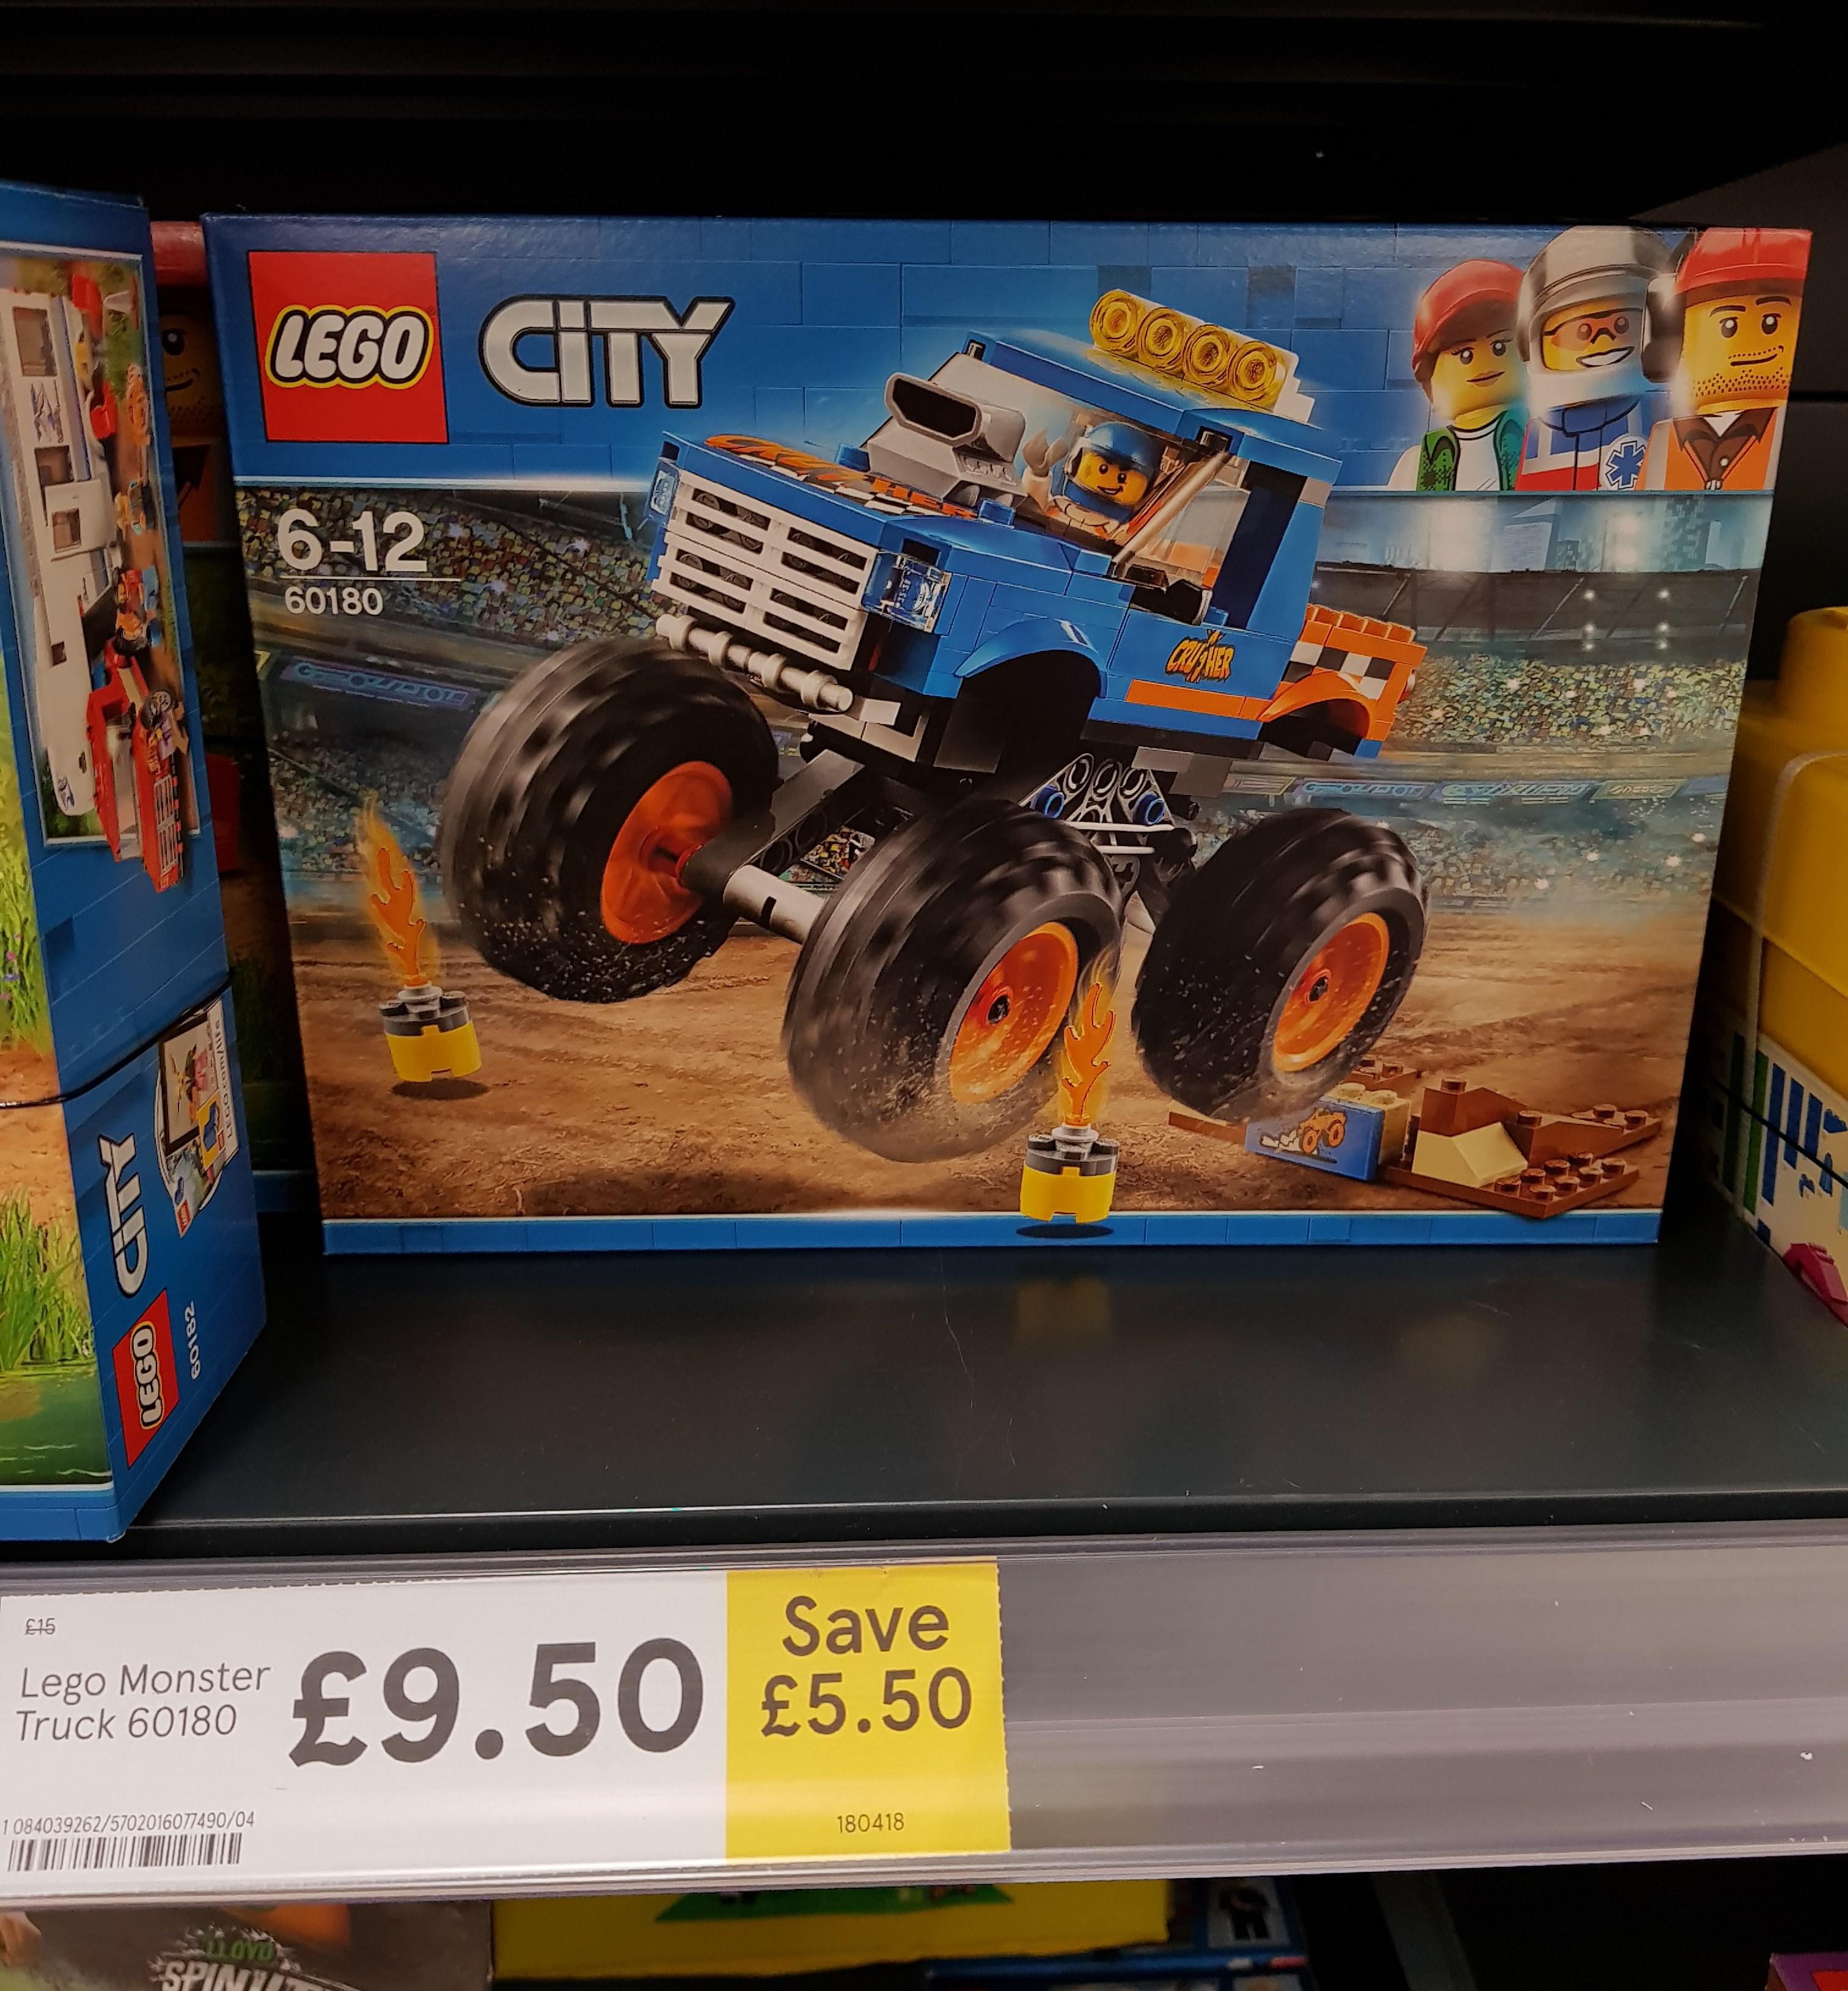 Lego City Monster Truck, £9.50 @ Tesco, Hemel Hempstead